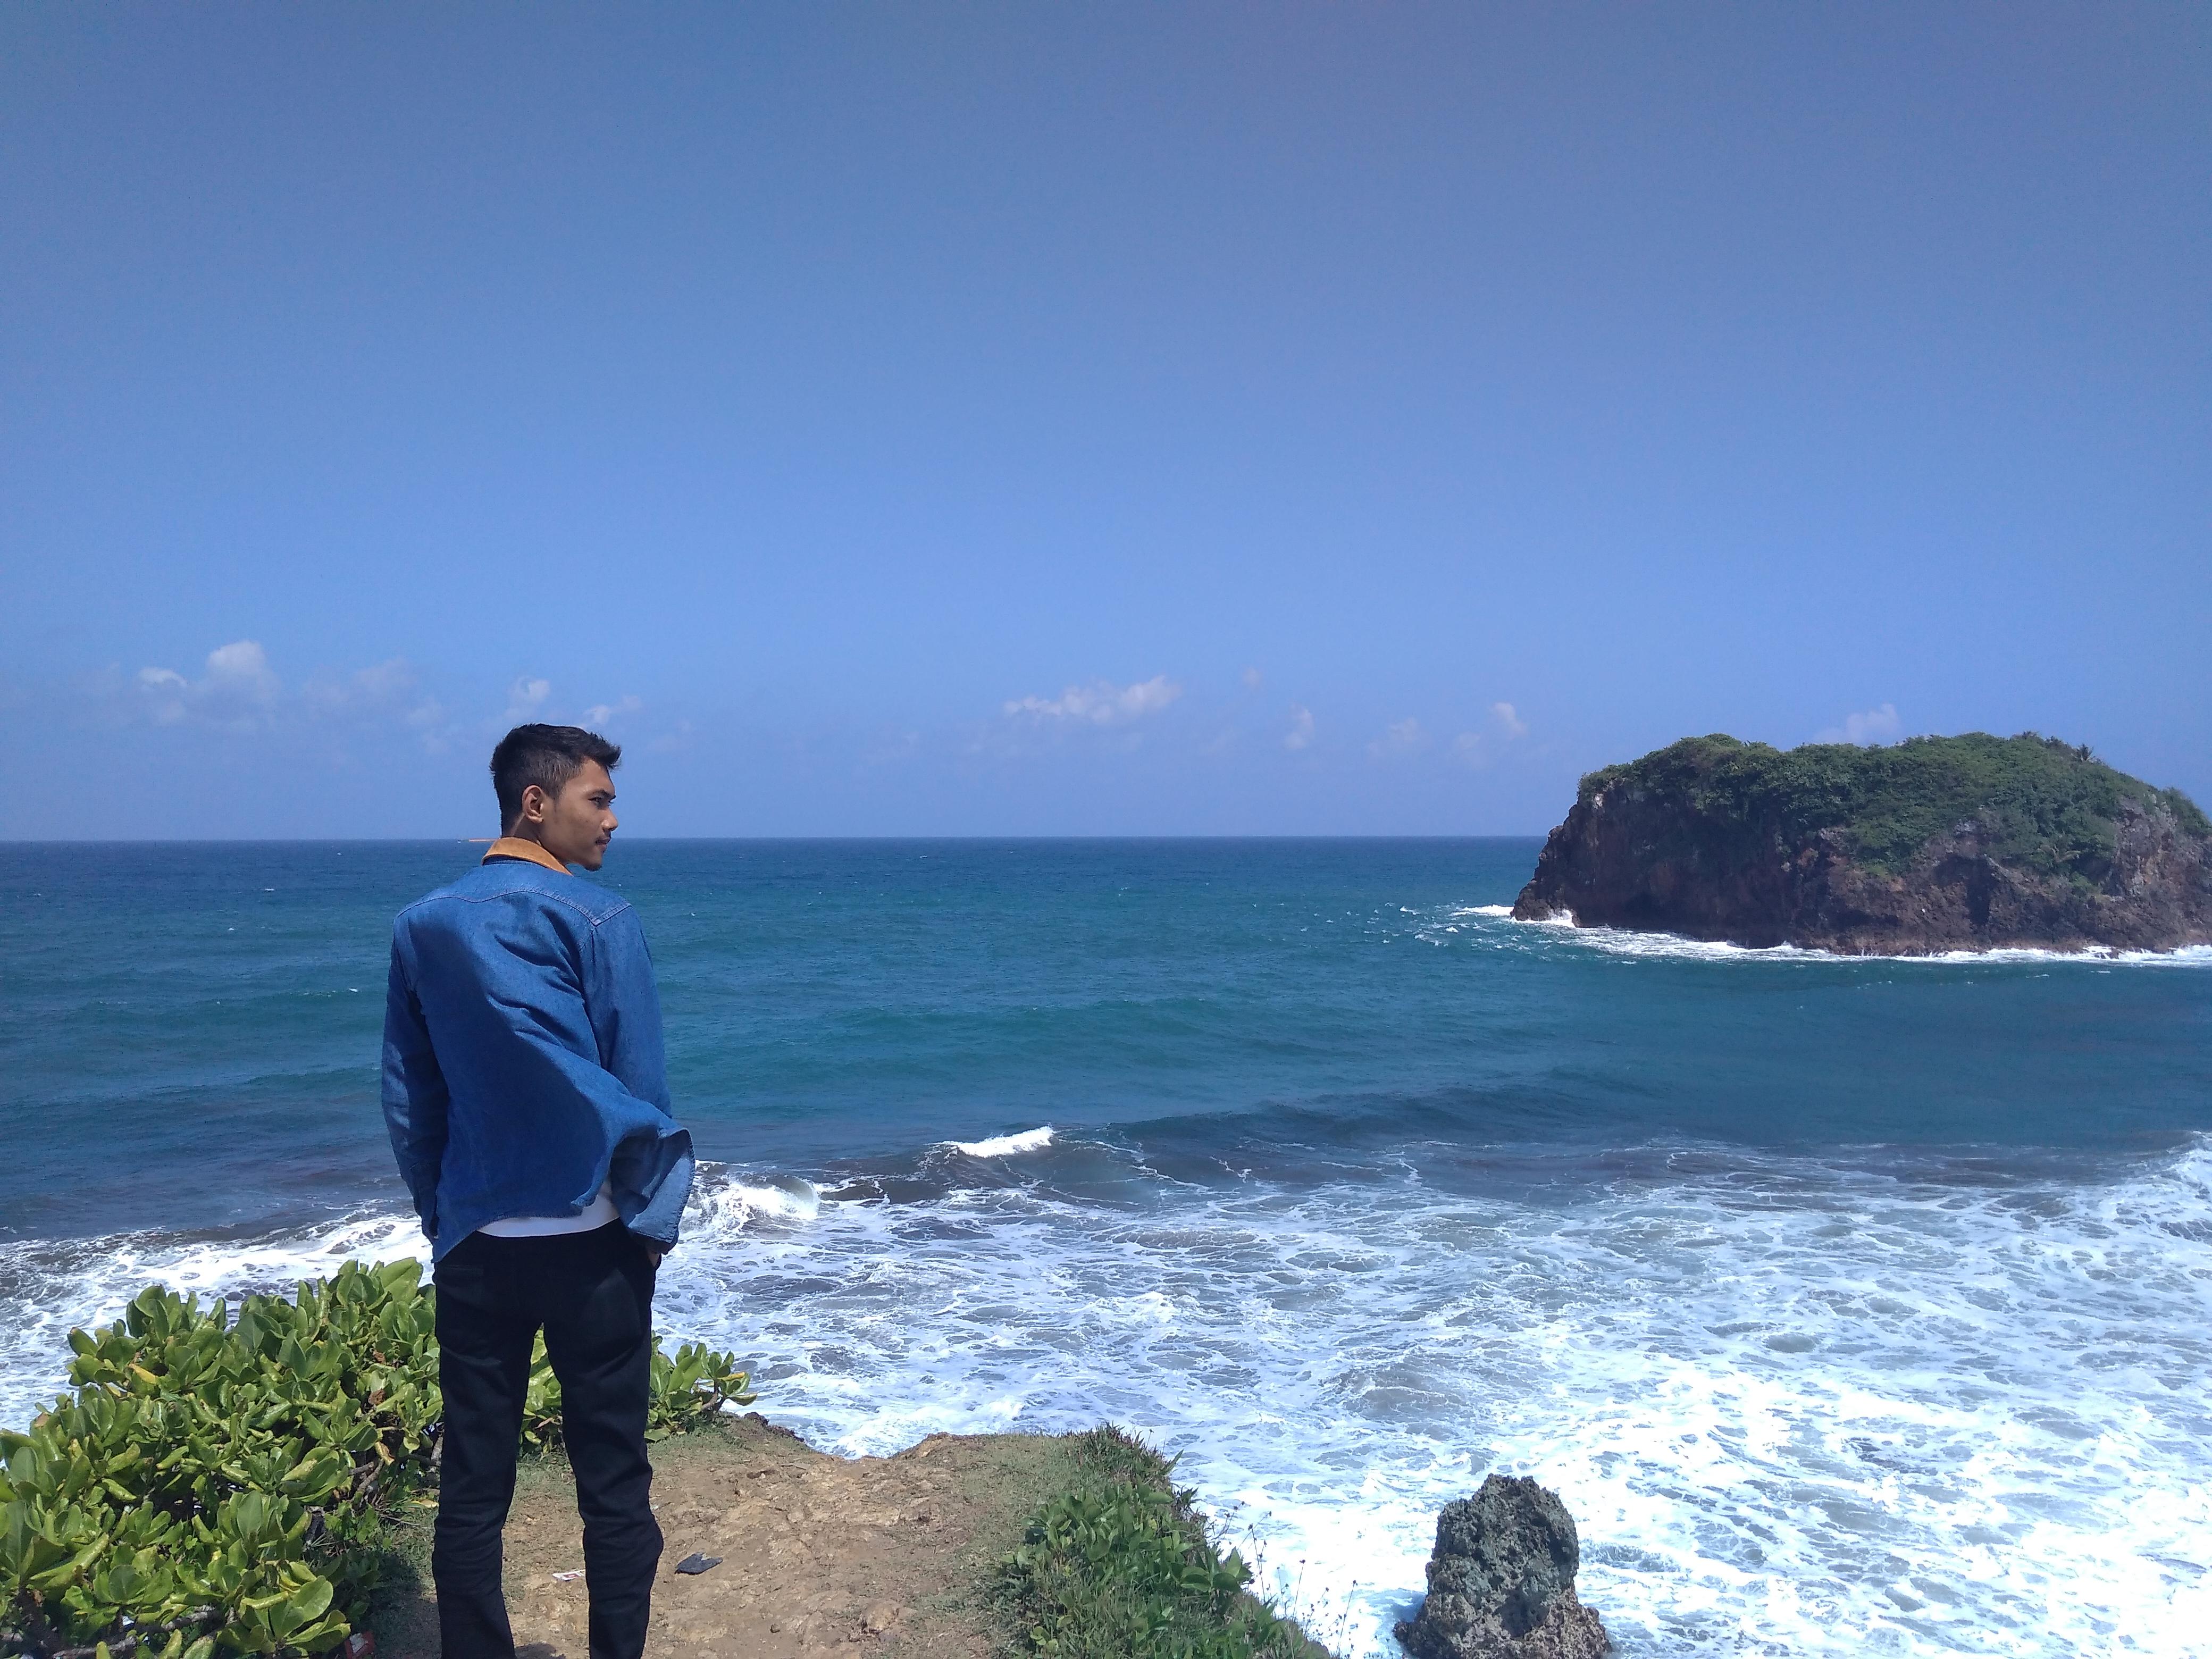 pantai karang tawulan tasikmalaya - Fotografi - Mi Community - Xiaomi